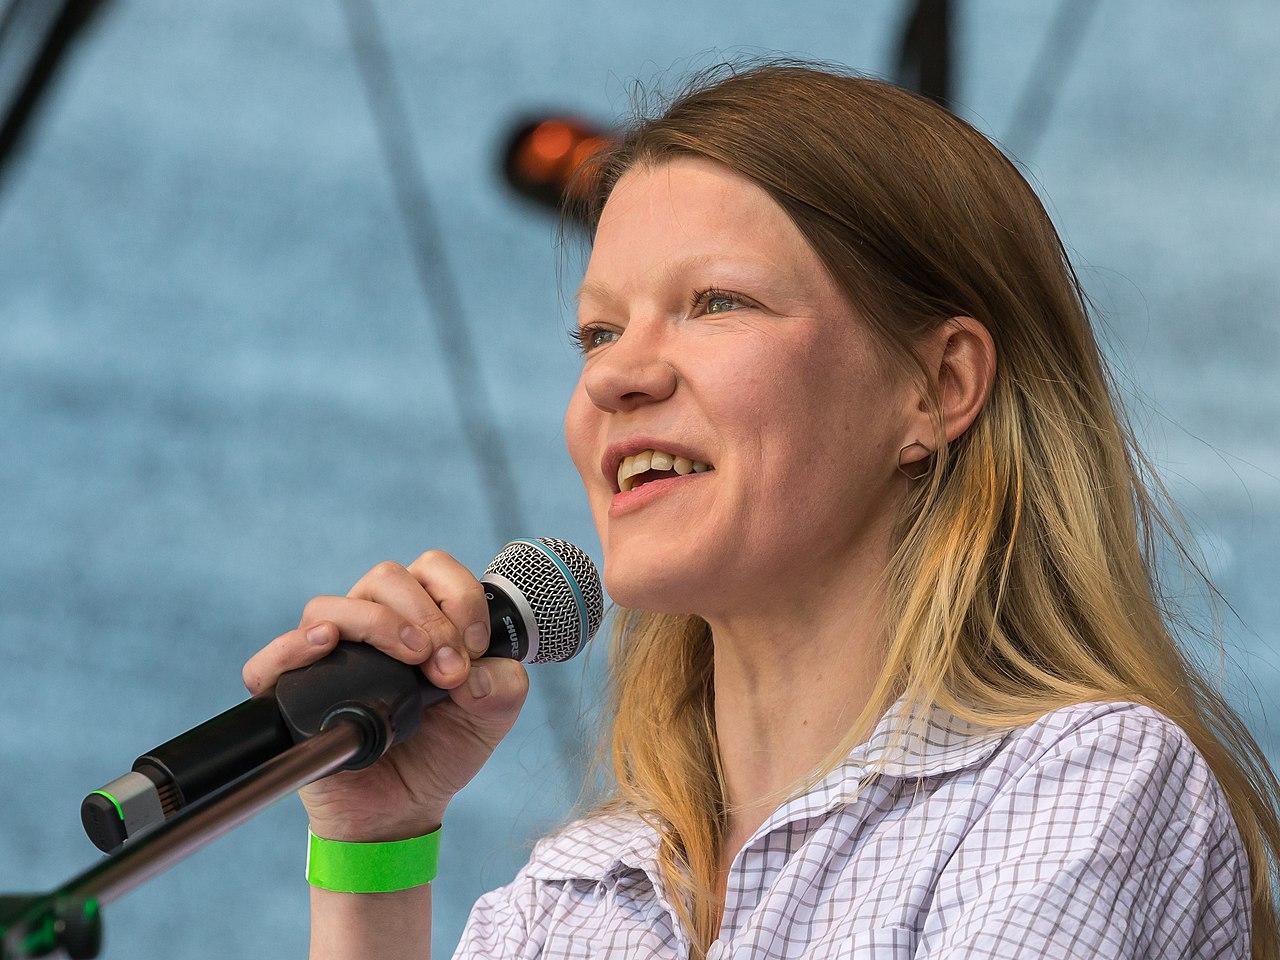 ColognePride 2018-Samstag-Hauptbühne-1600-Politblock-Doris Achelwilm-7638.jpg